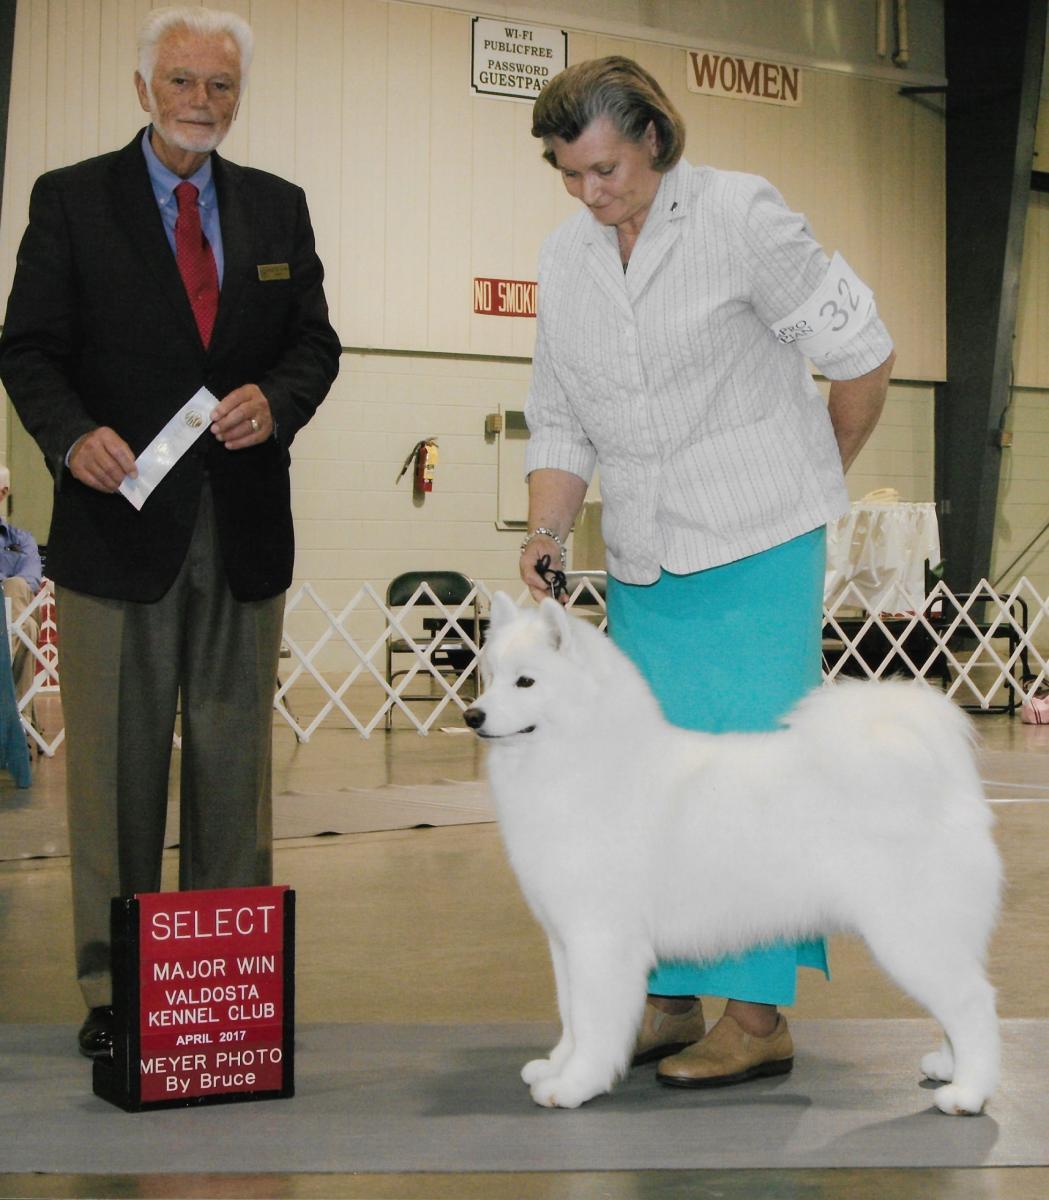 Select Major Win Valdosta Kennel Club